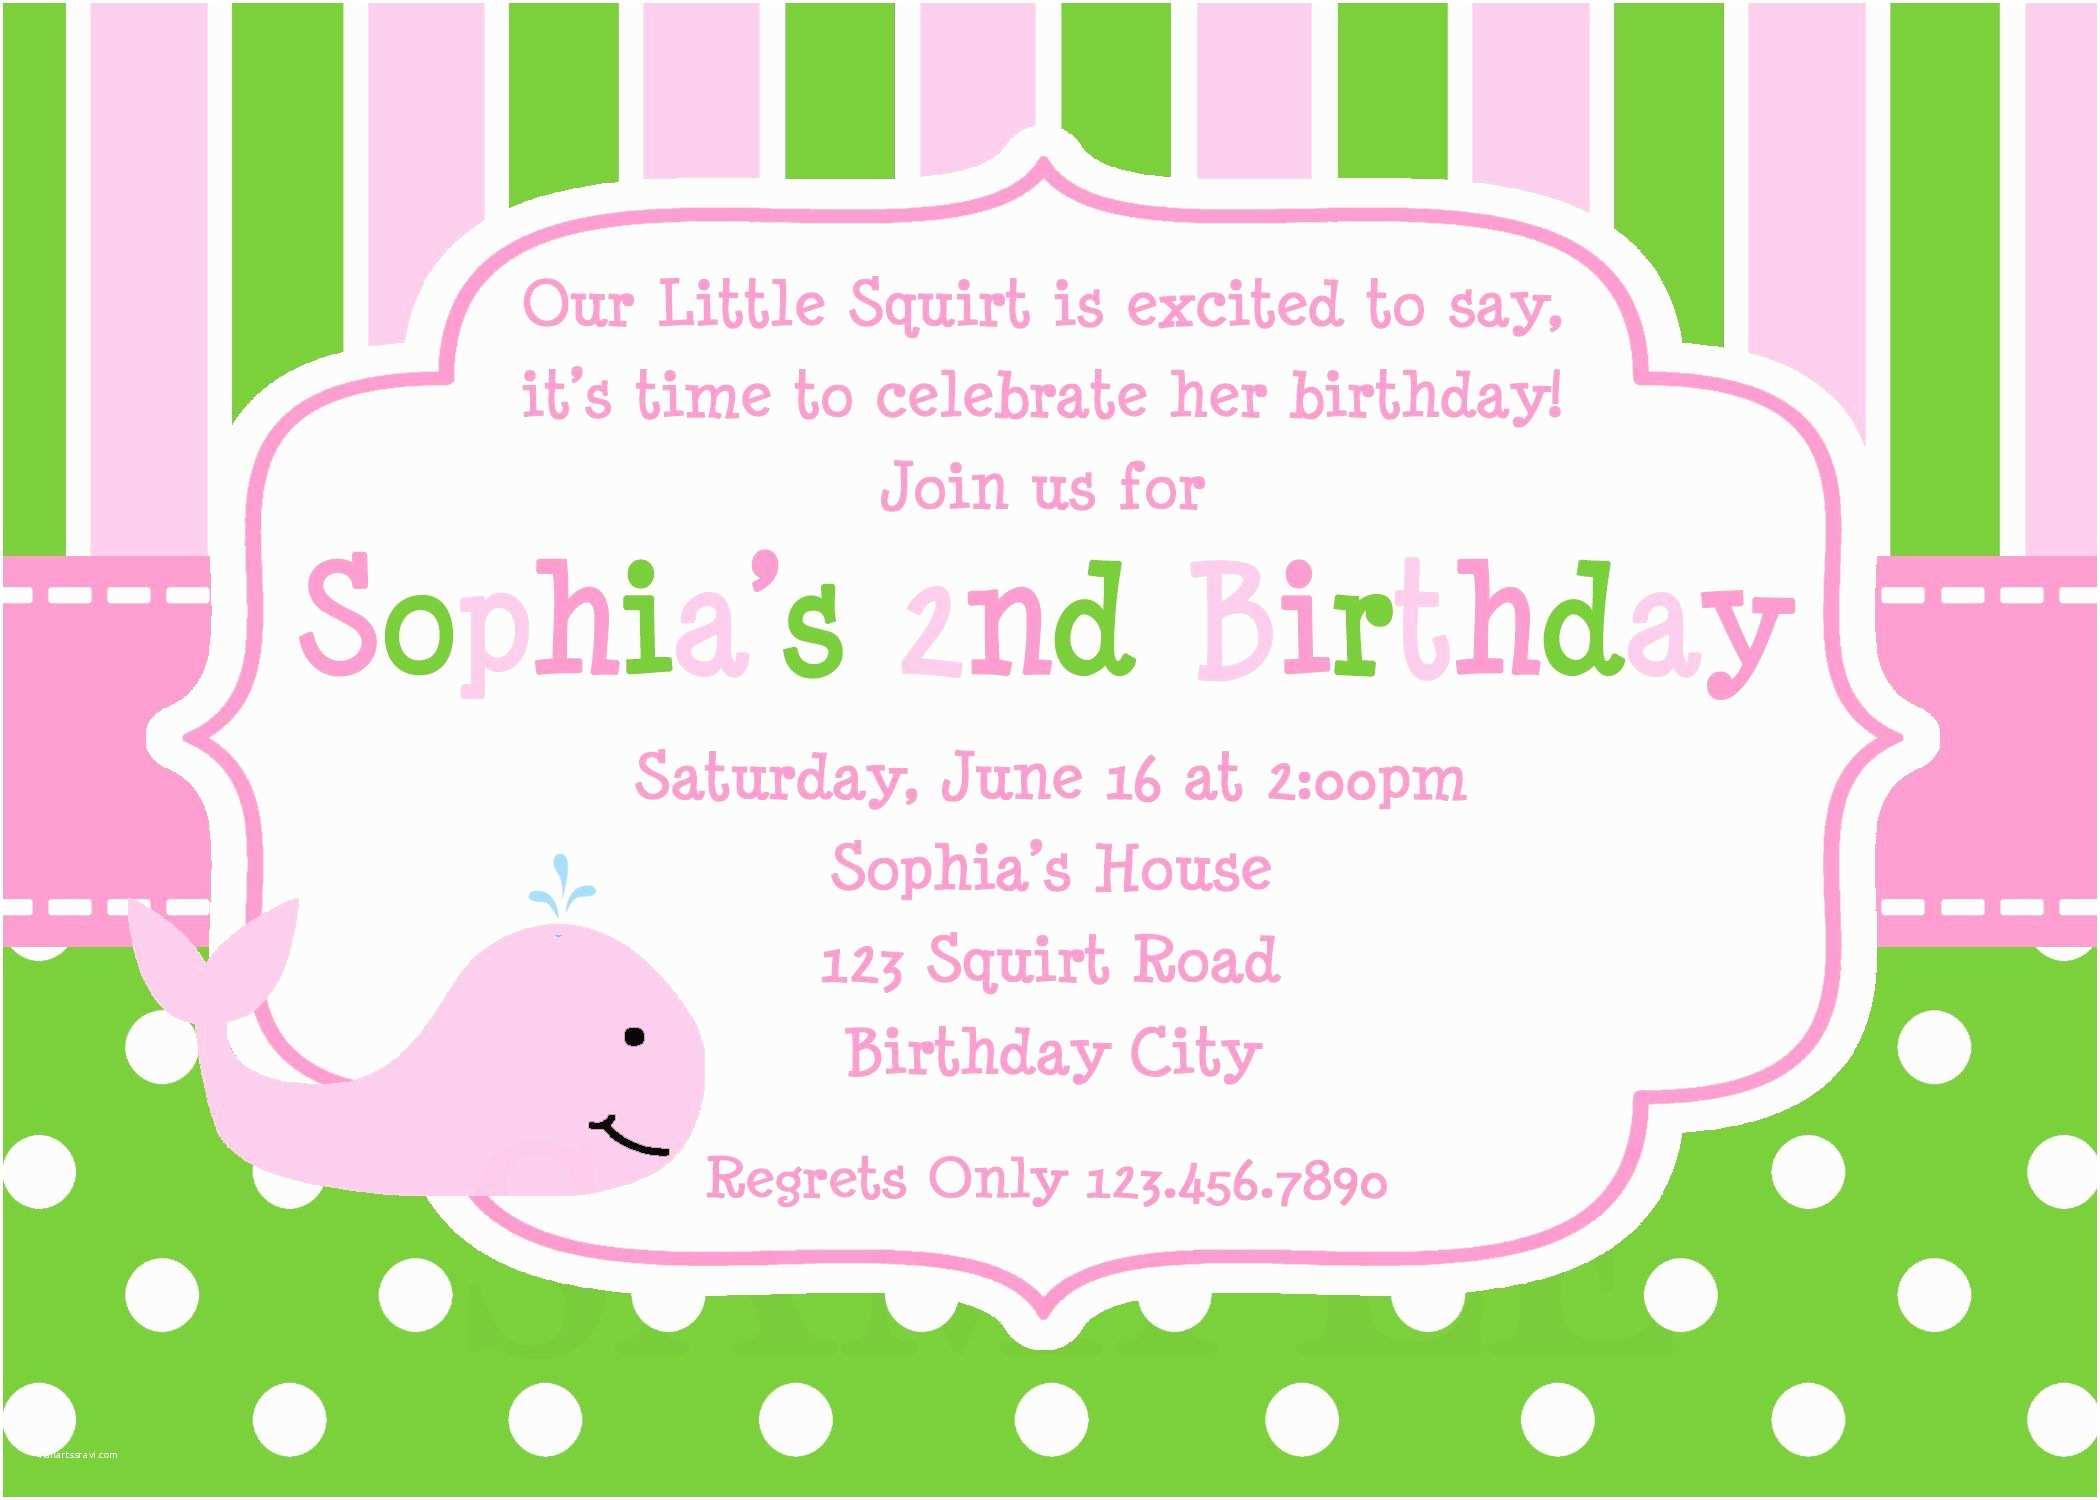 Sample Birthday Invitation 21 Kids Birthday Invitation Wording that We Can Make